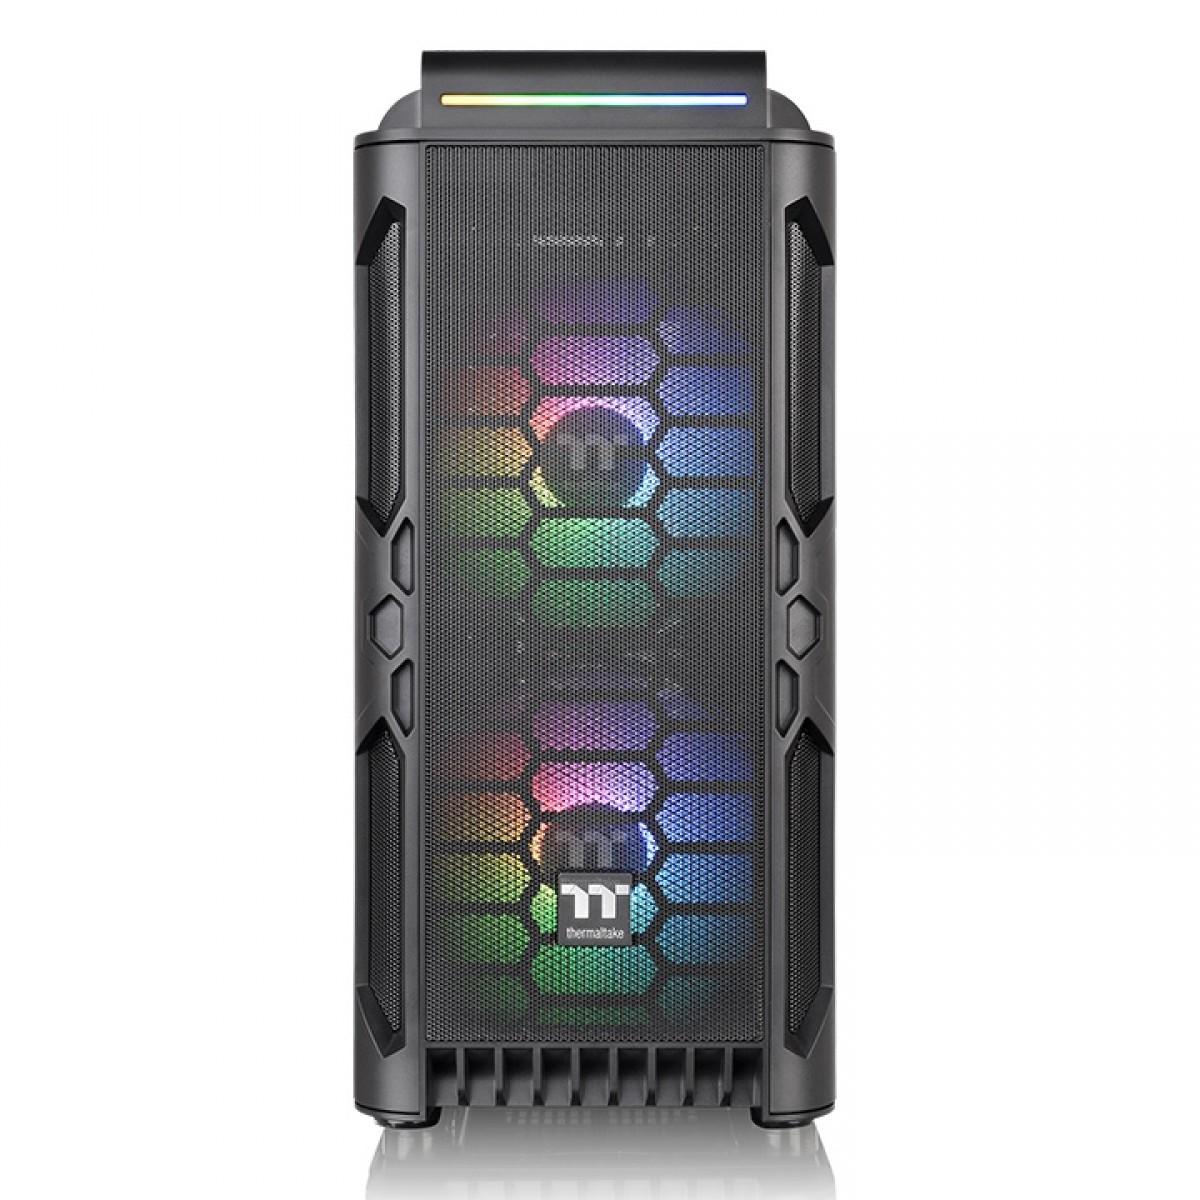 Gabinete Gamer Thermaltake Level 20 RS, ARGB, Midtower, 2 Vidros Temperados, Black, Sem Fonte, Com 3 Fans, CA-1P8-00M1WN-00